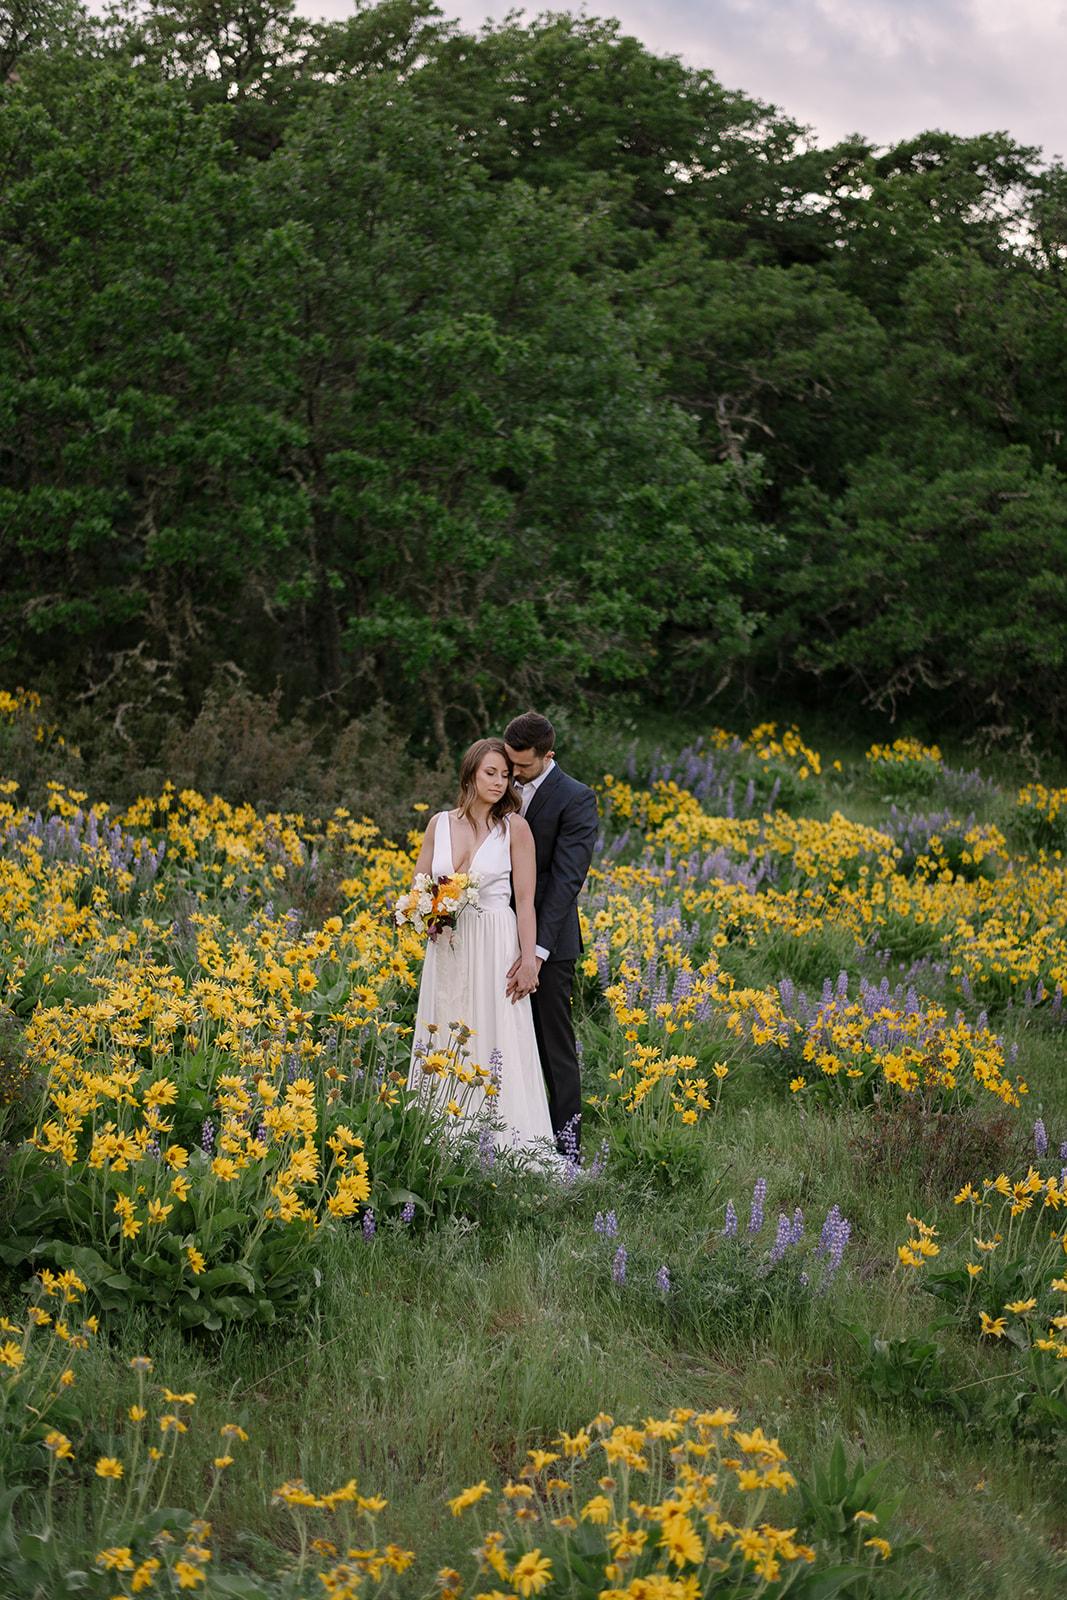 kamea_events_wedding_planner_portland_DeusAmor34.jpg